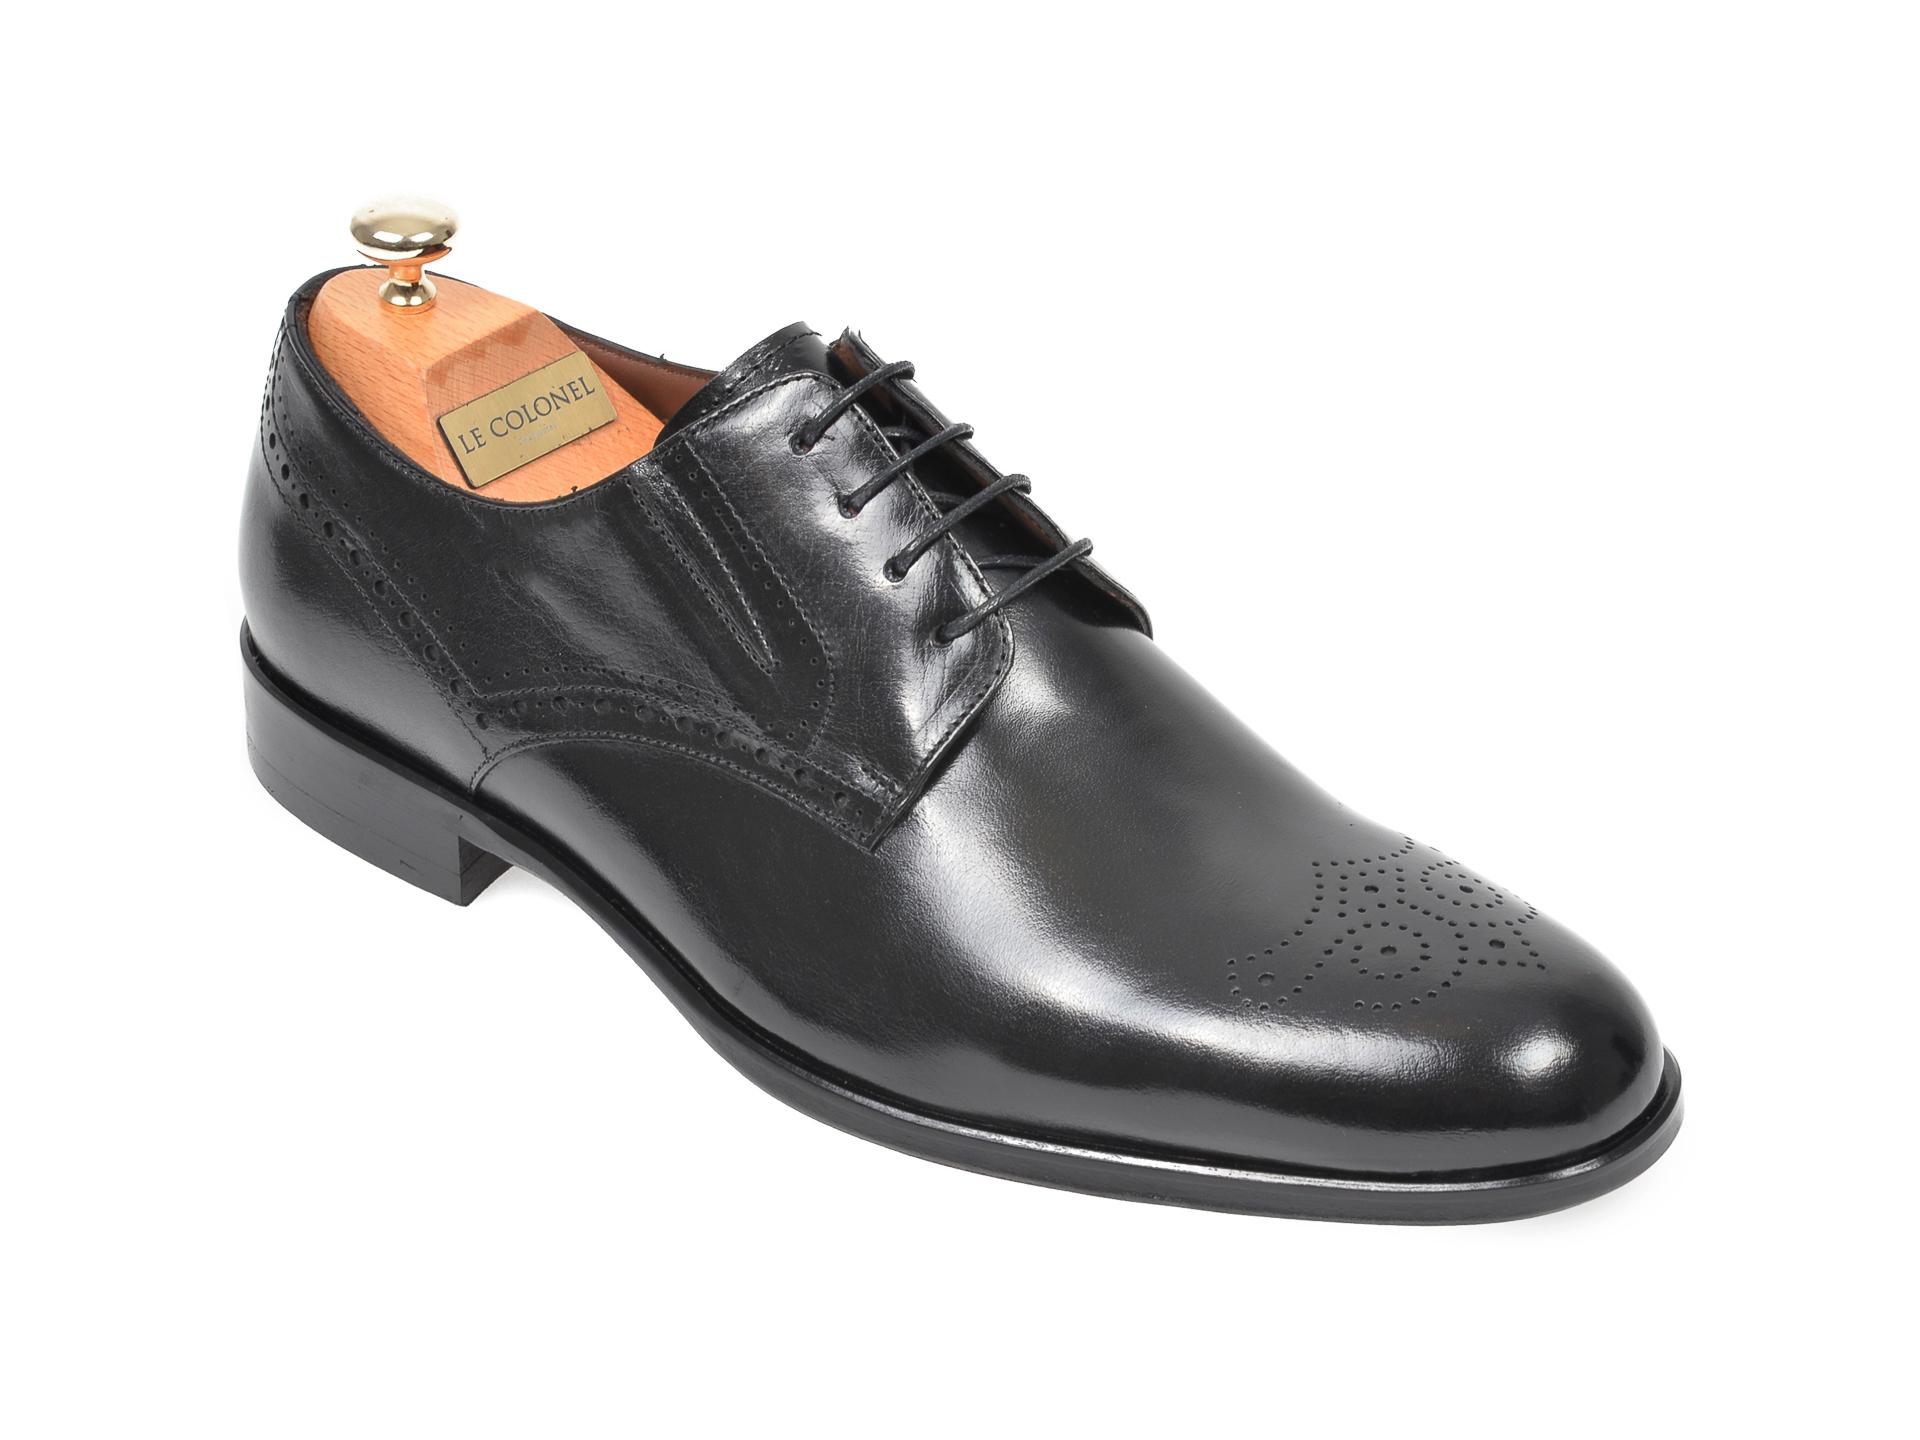 Pantofi LE COLONEL negri, 62401, din piele naturala imagine